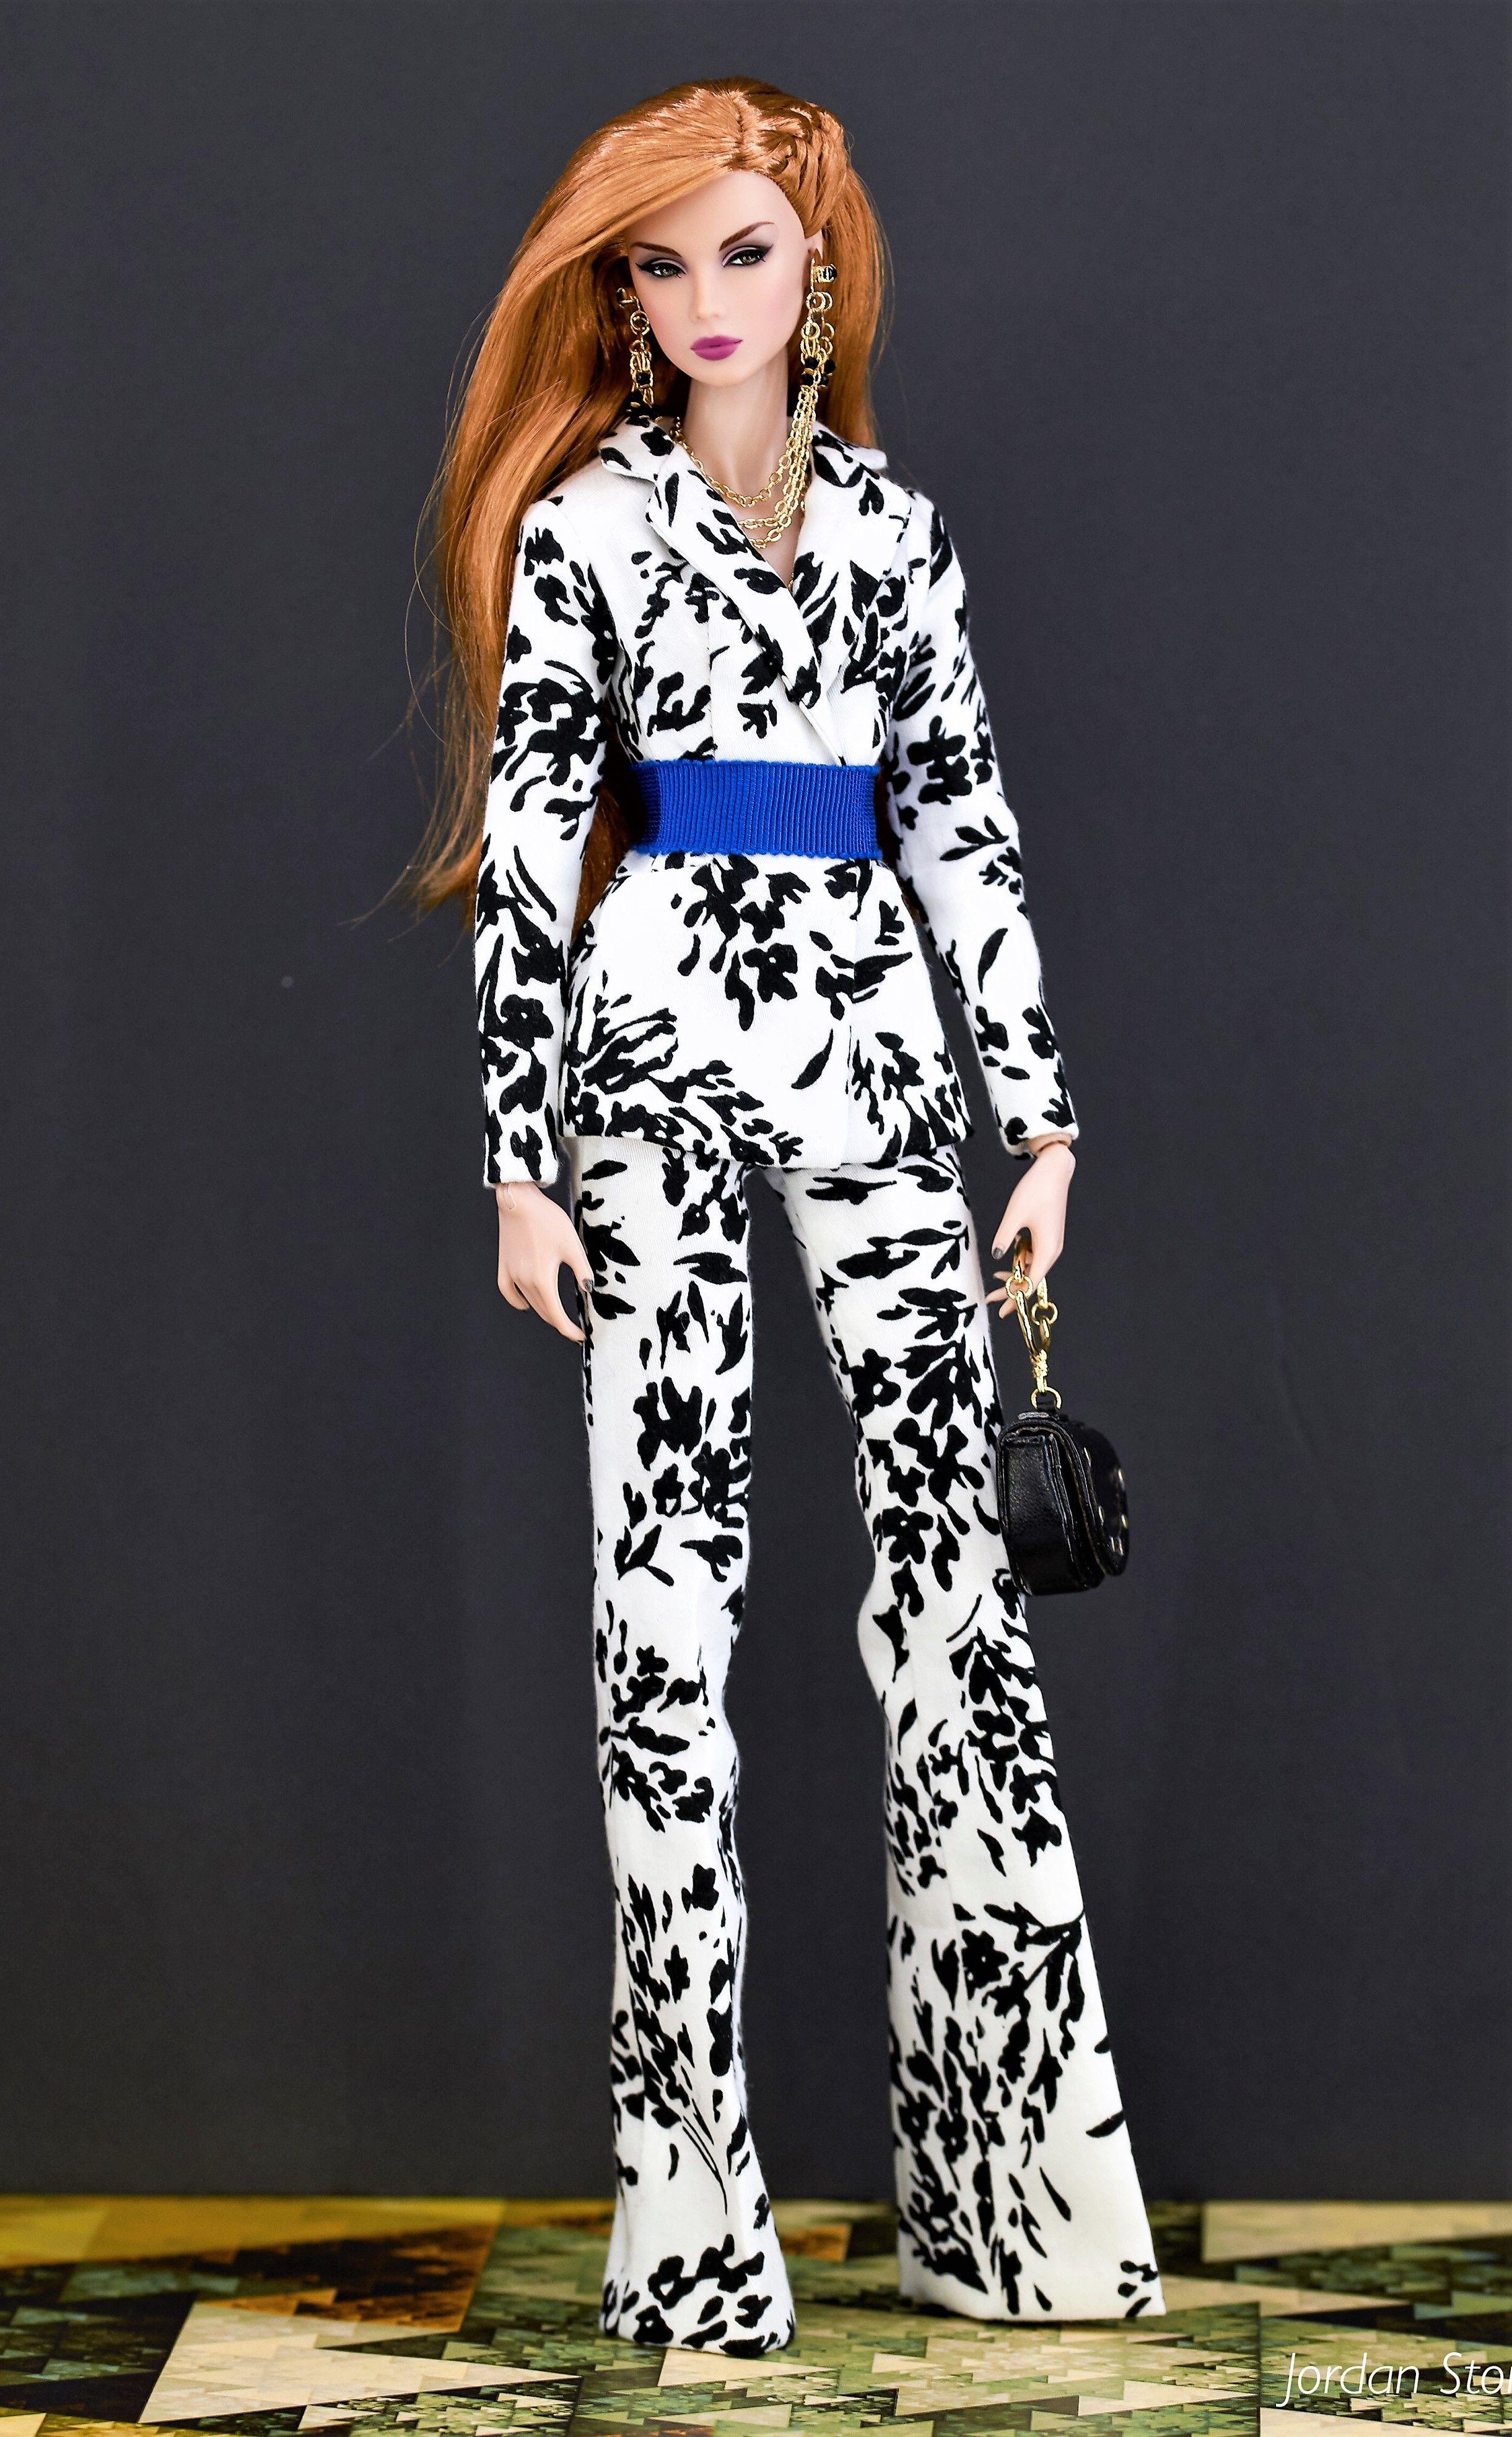 BARBIE CURVY vestiti outfit vestiti bambole Pantaloni Leggings